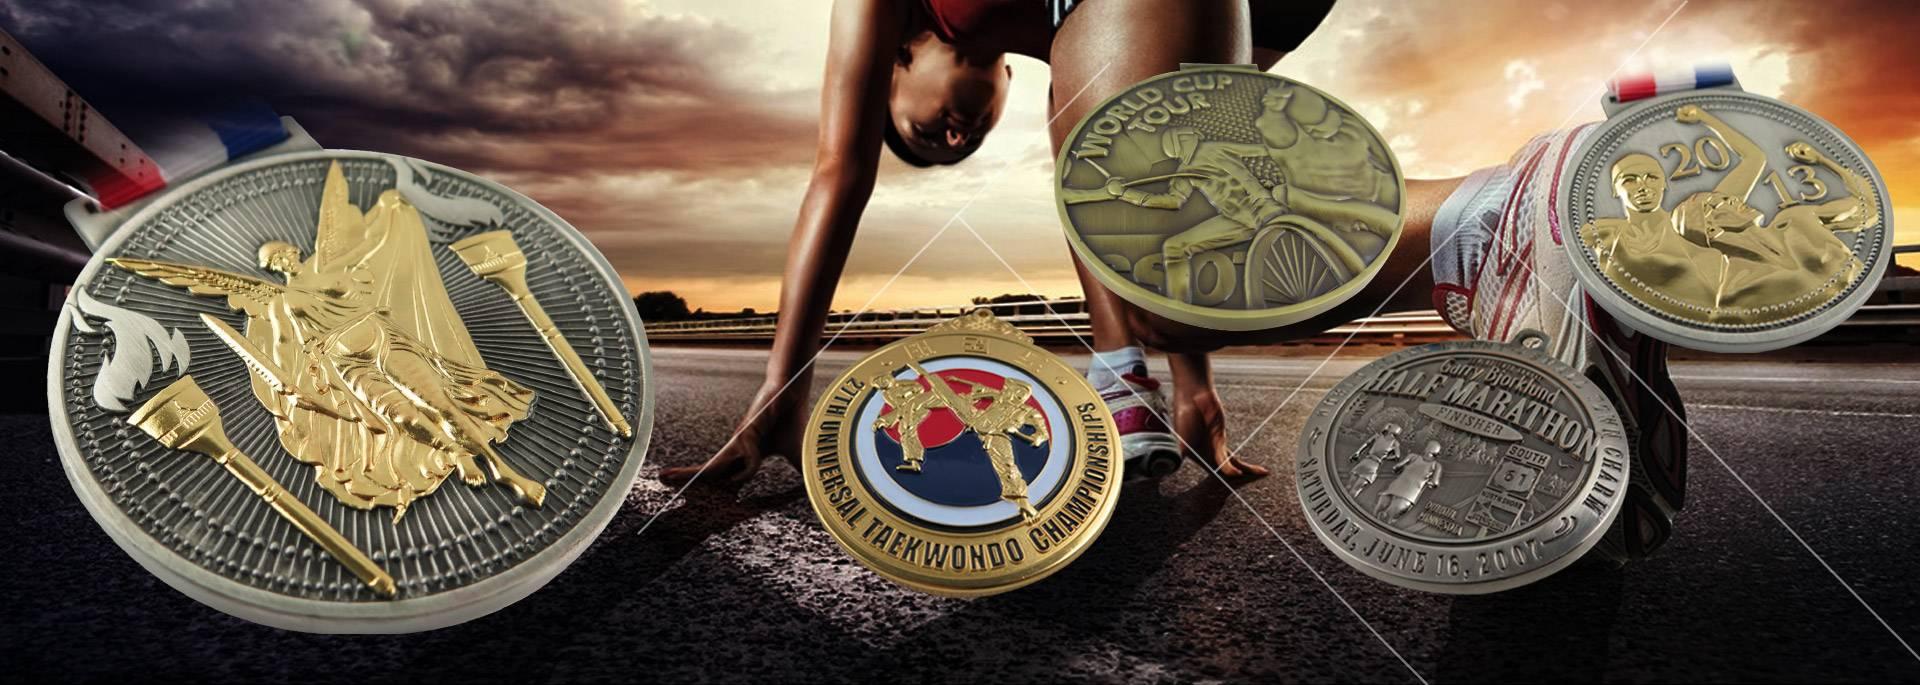 Custom Design Sports Medal